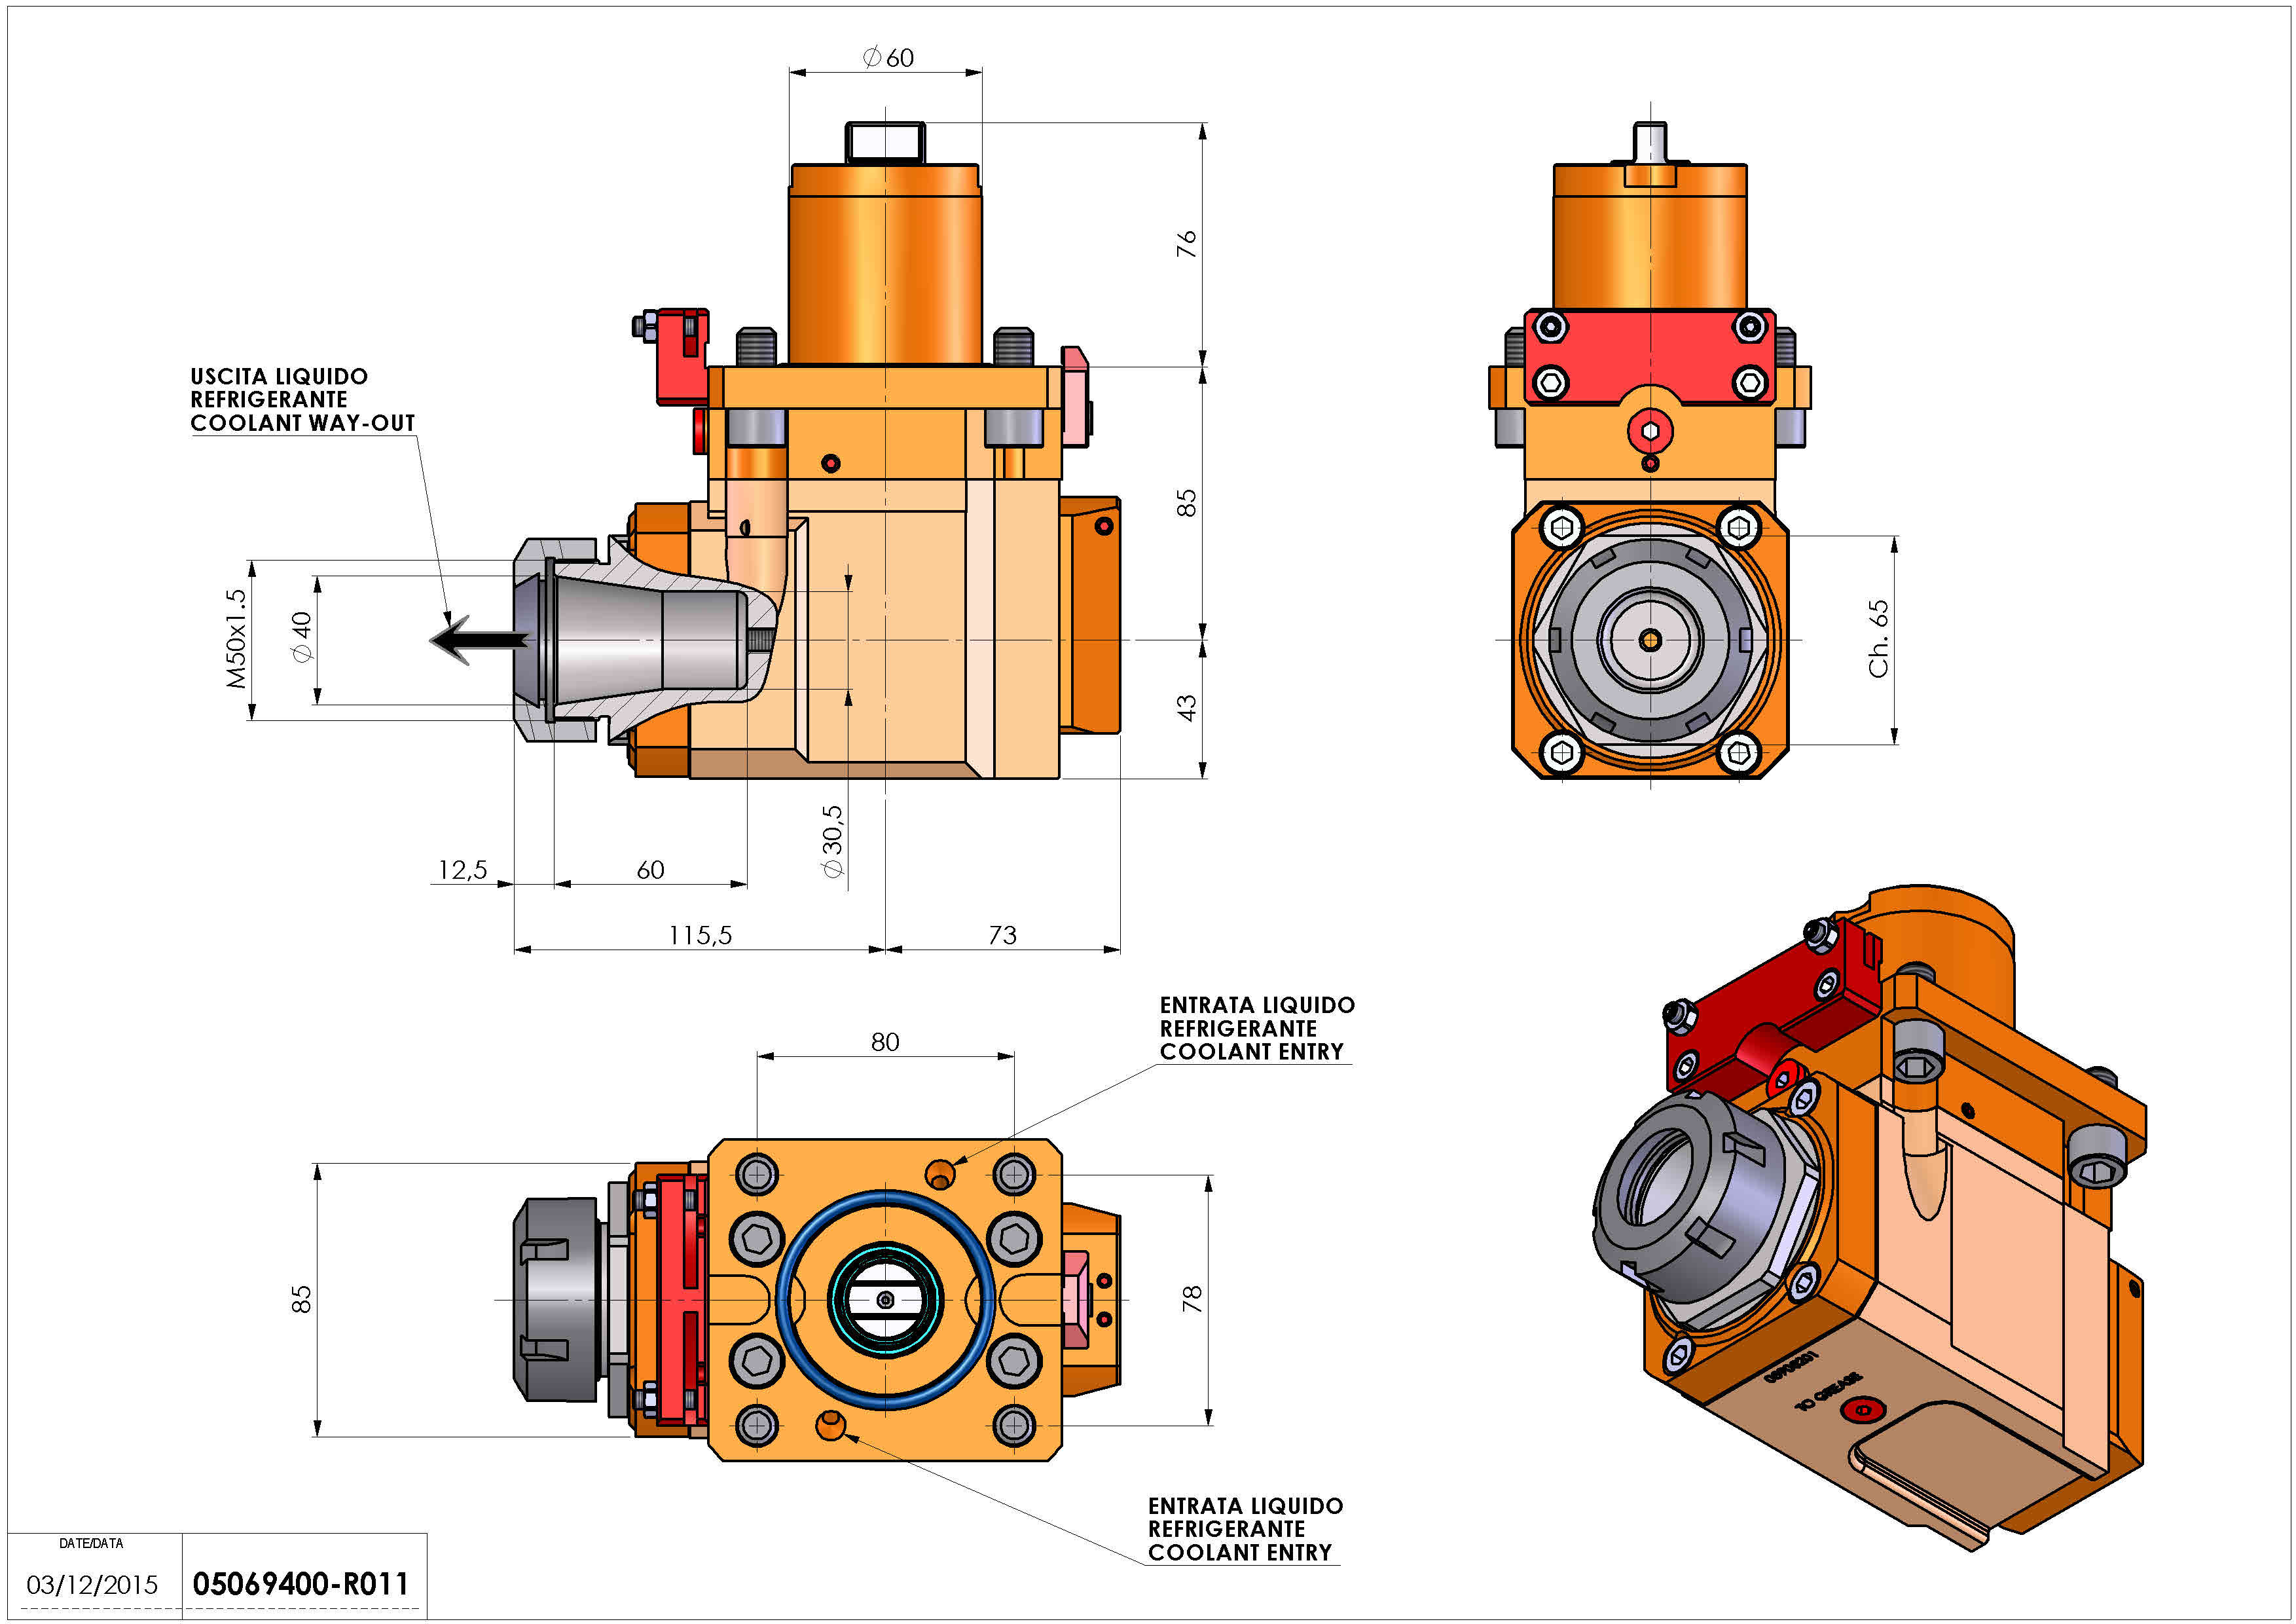 Technical image - LT-A D60 ER40 RF H85 OK OKUMA LB-300 MW MWY.